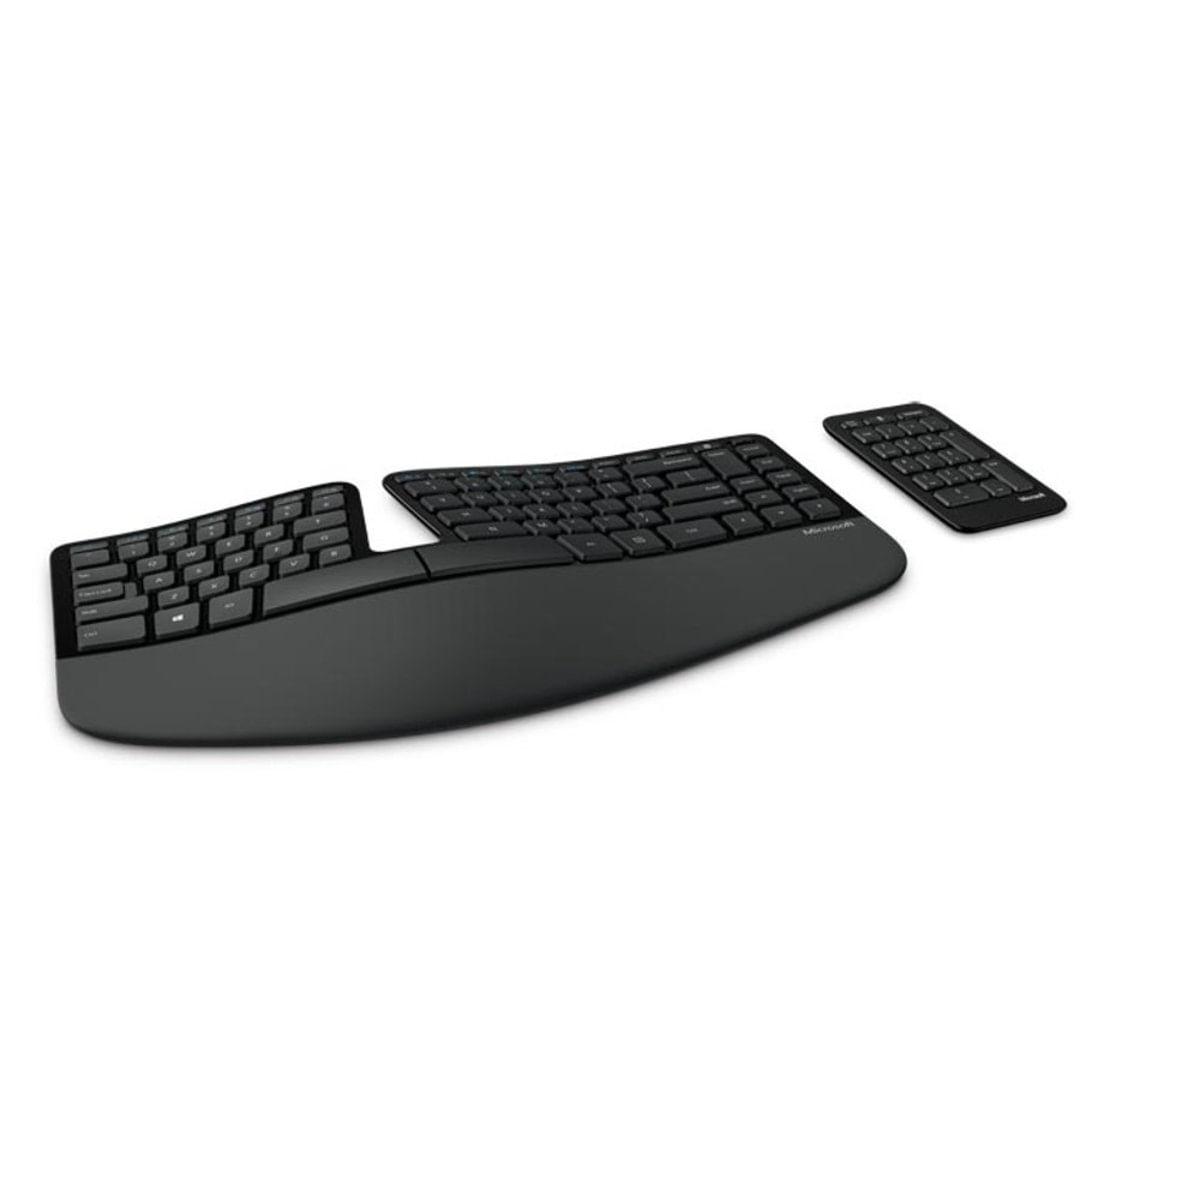 Teclado Wireless Sculpt Ergonomic Desktop 5kv-00001 Microsoft